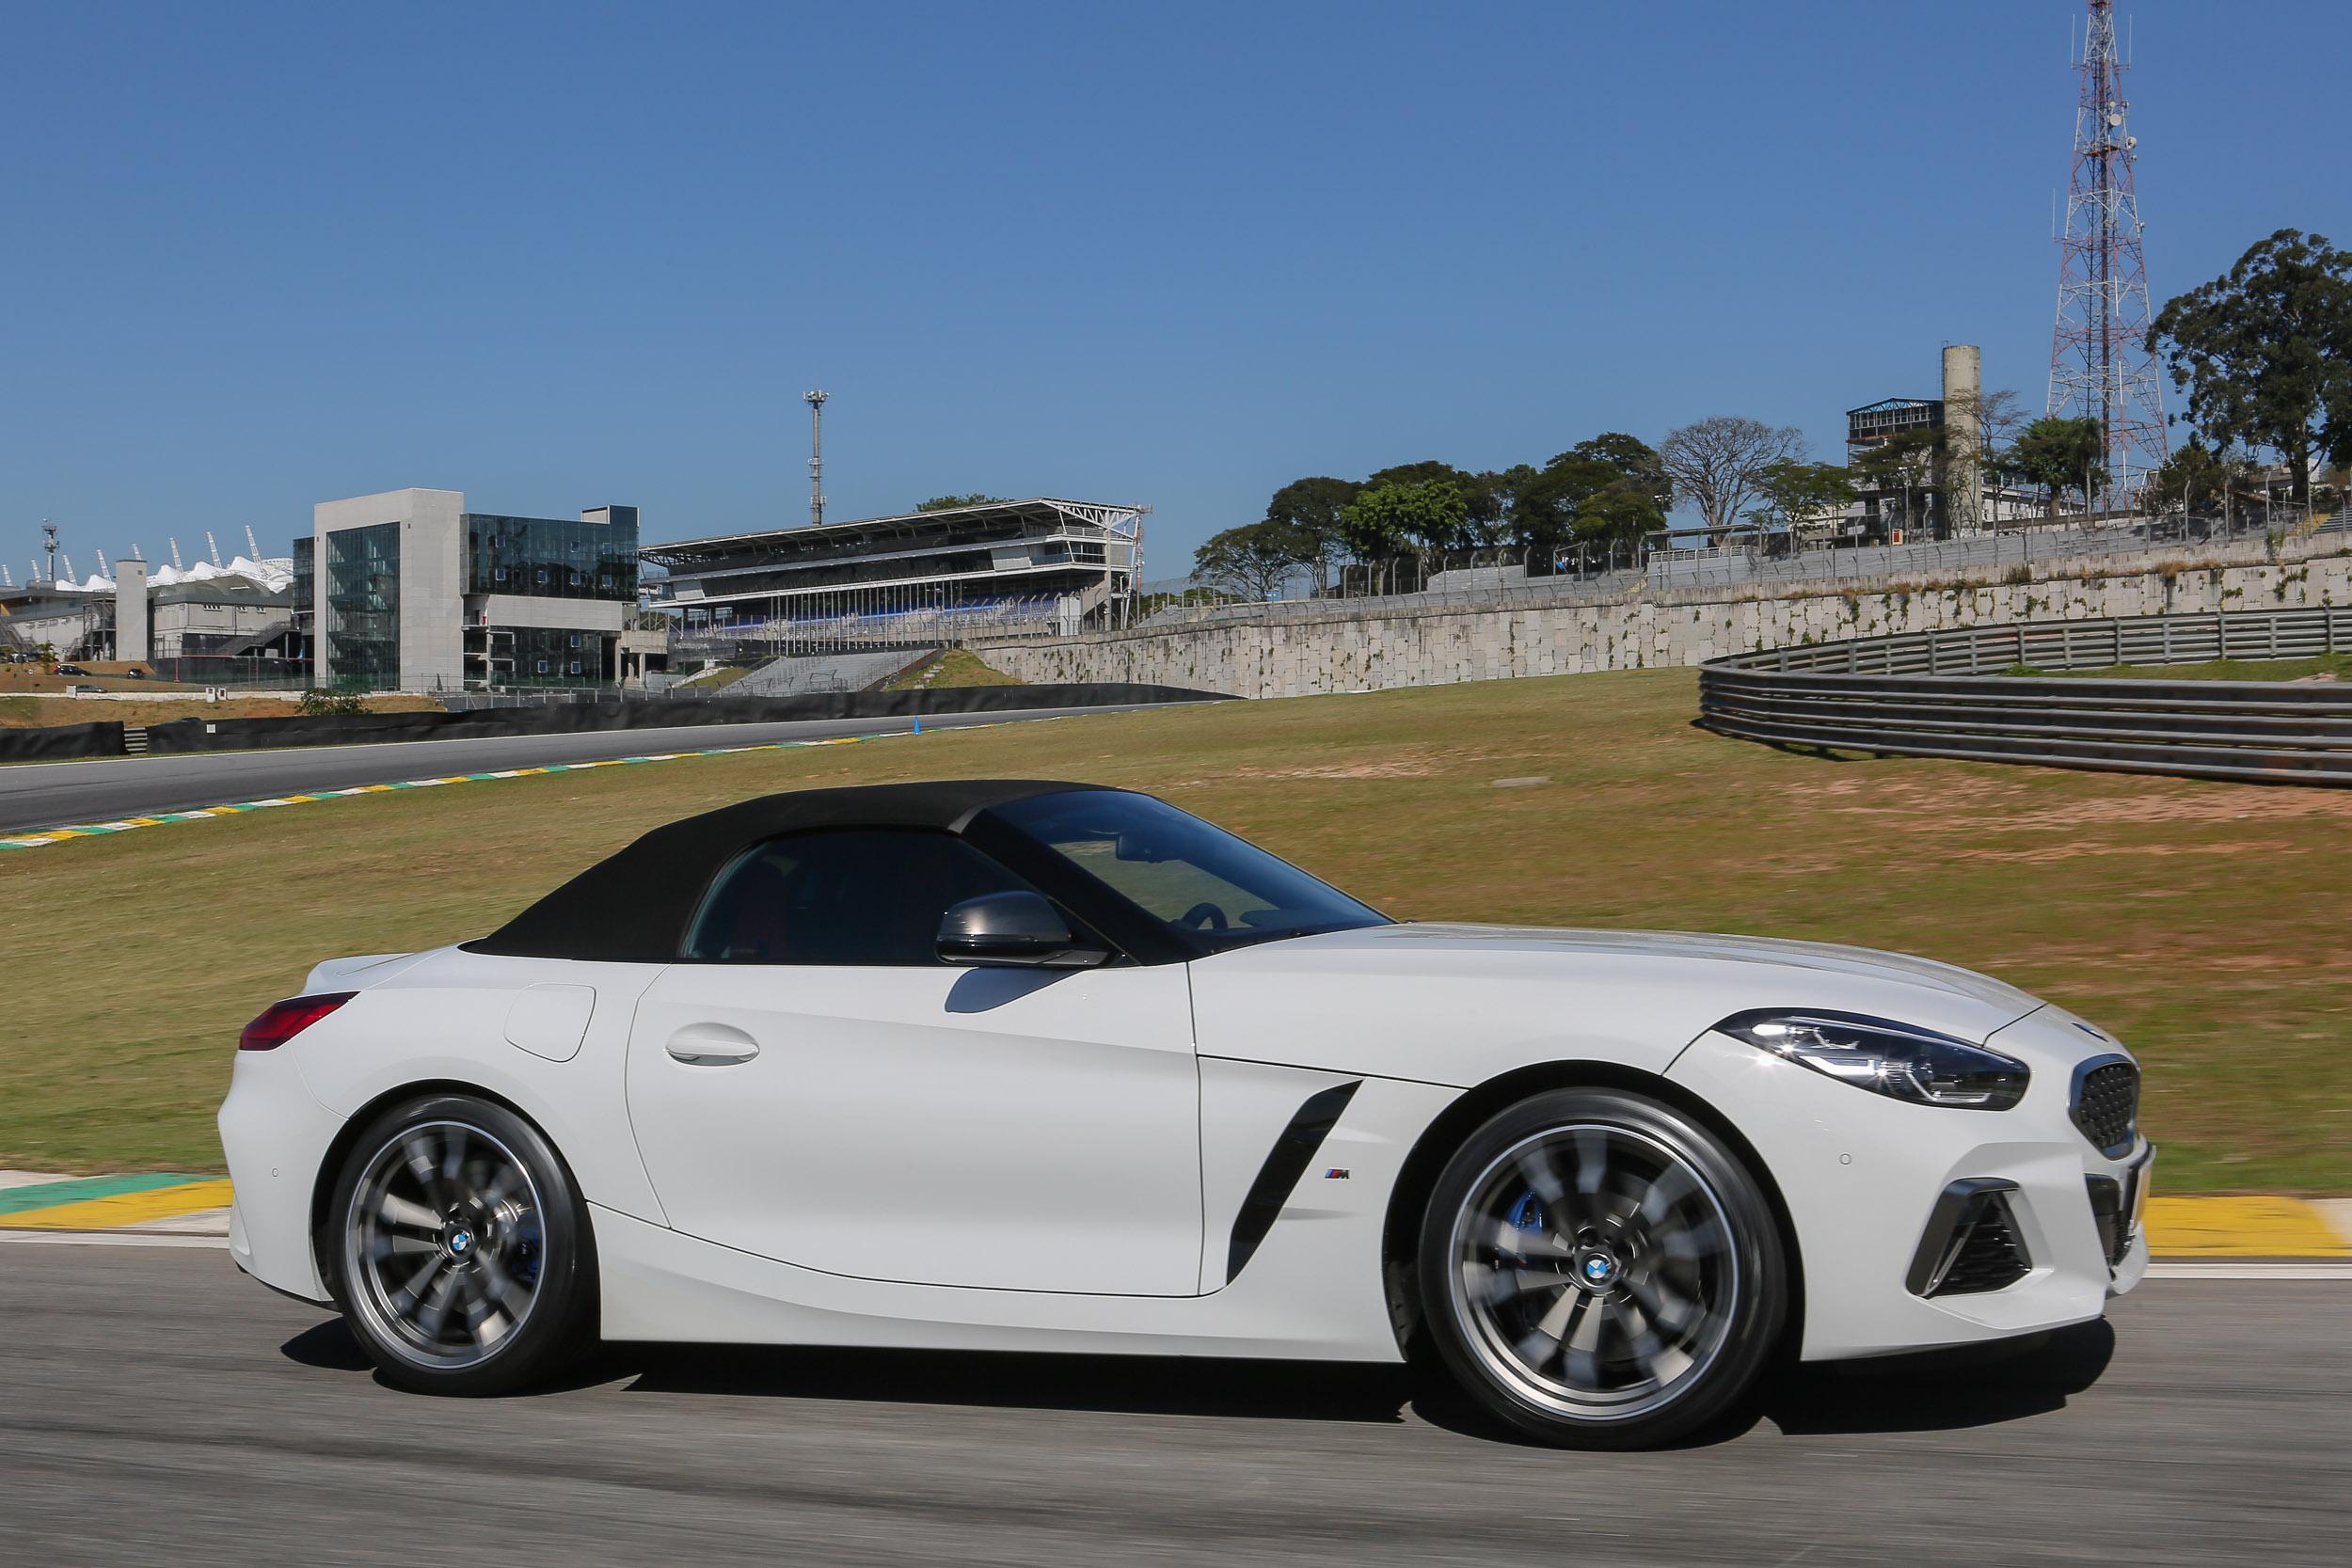 BMW Z4 na pista de Interlagos